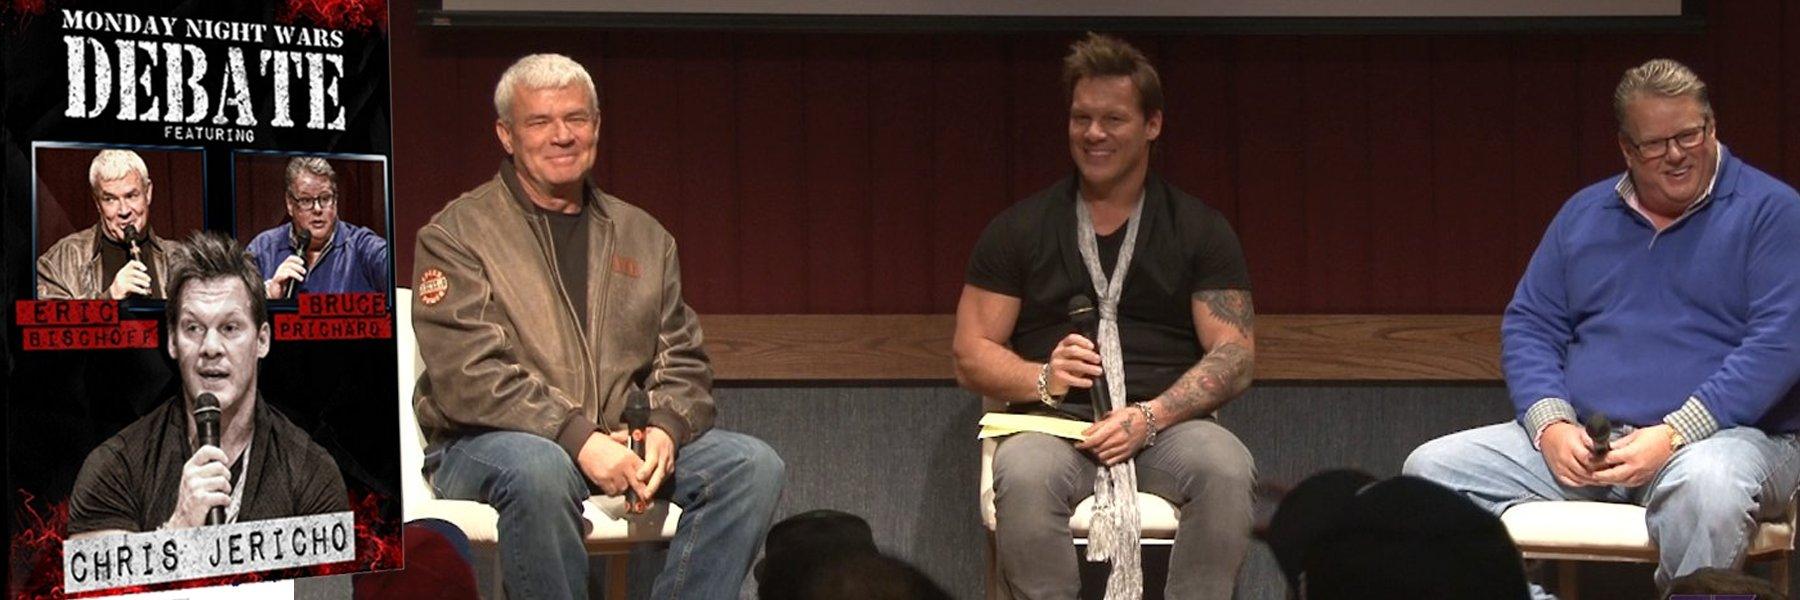 Monday Night Wars Debate: Eric Bischoff, Bruce Prichard & Chris Jericho